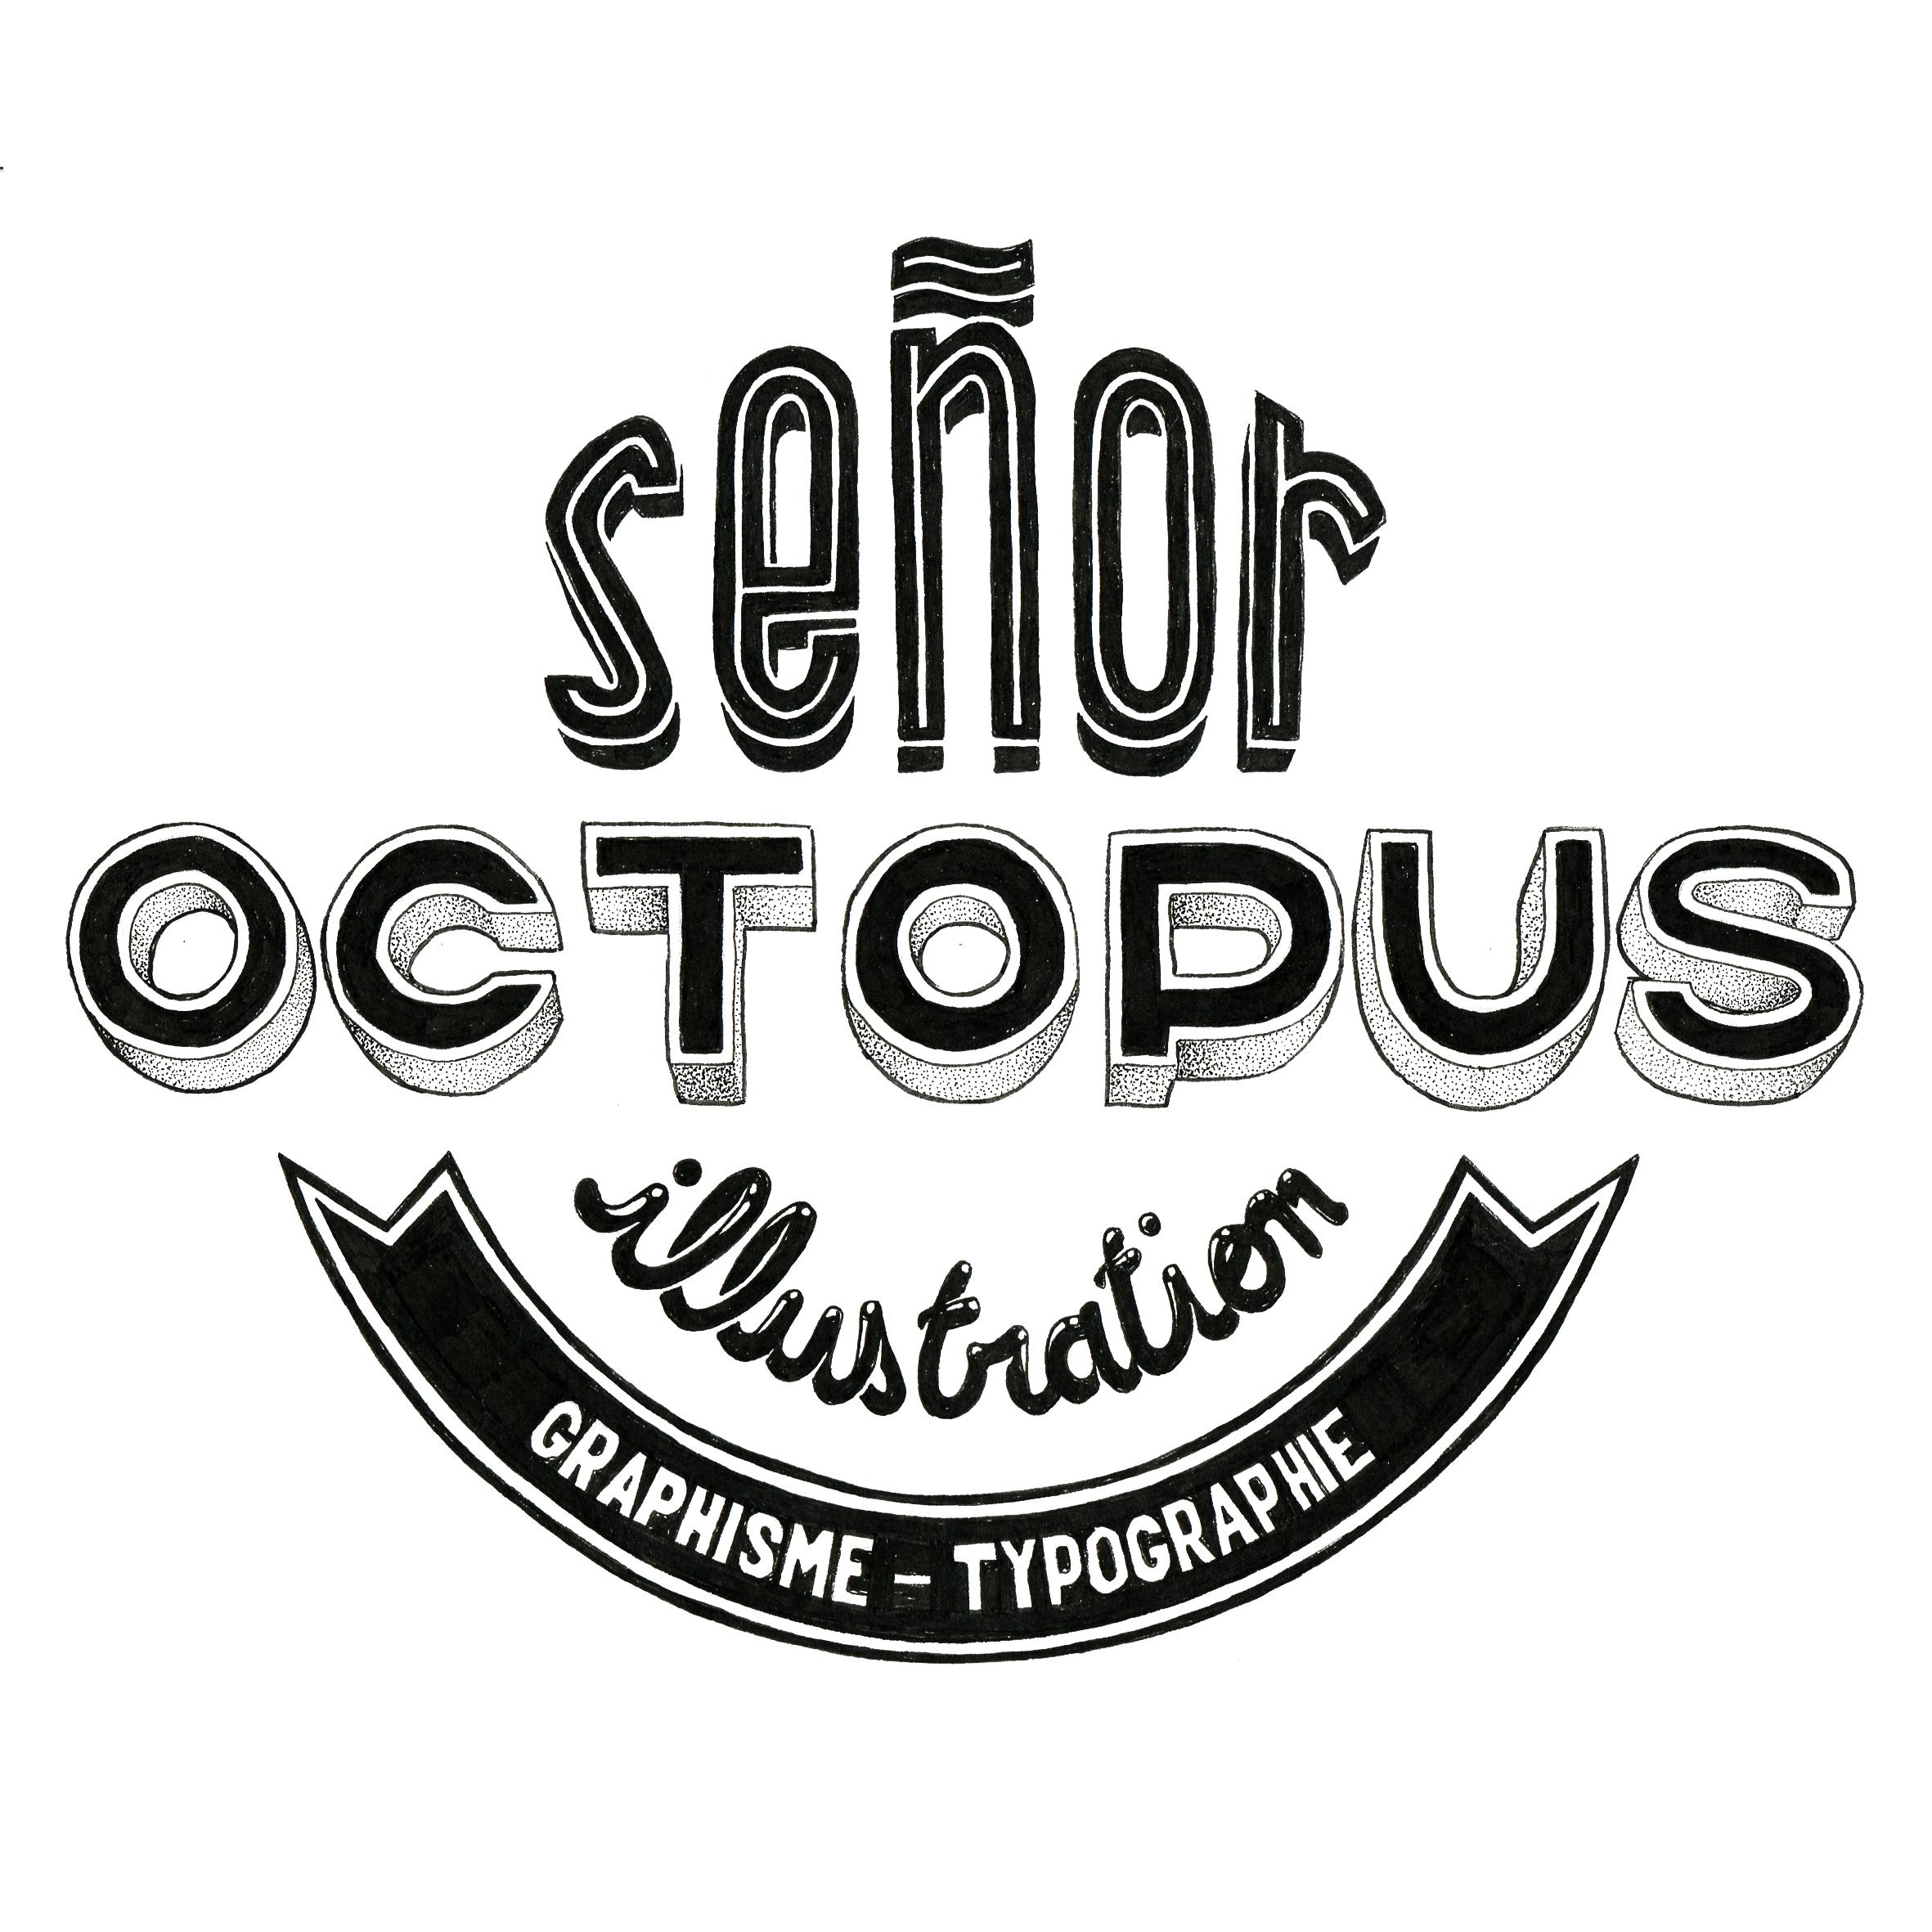 Senoroctopus